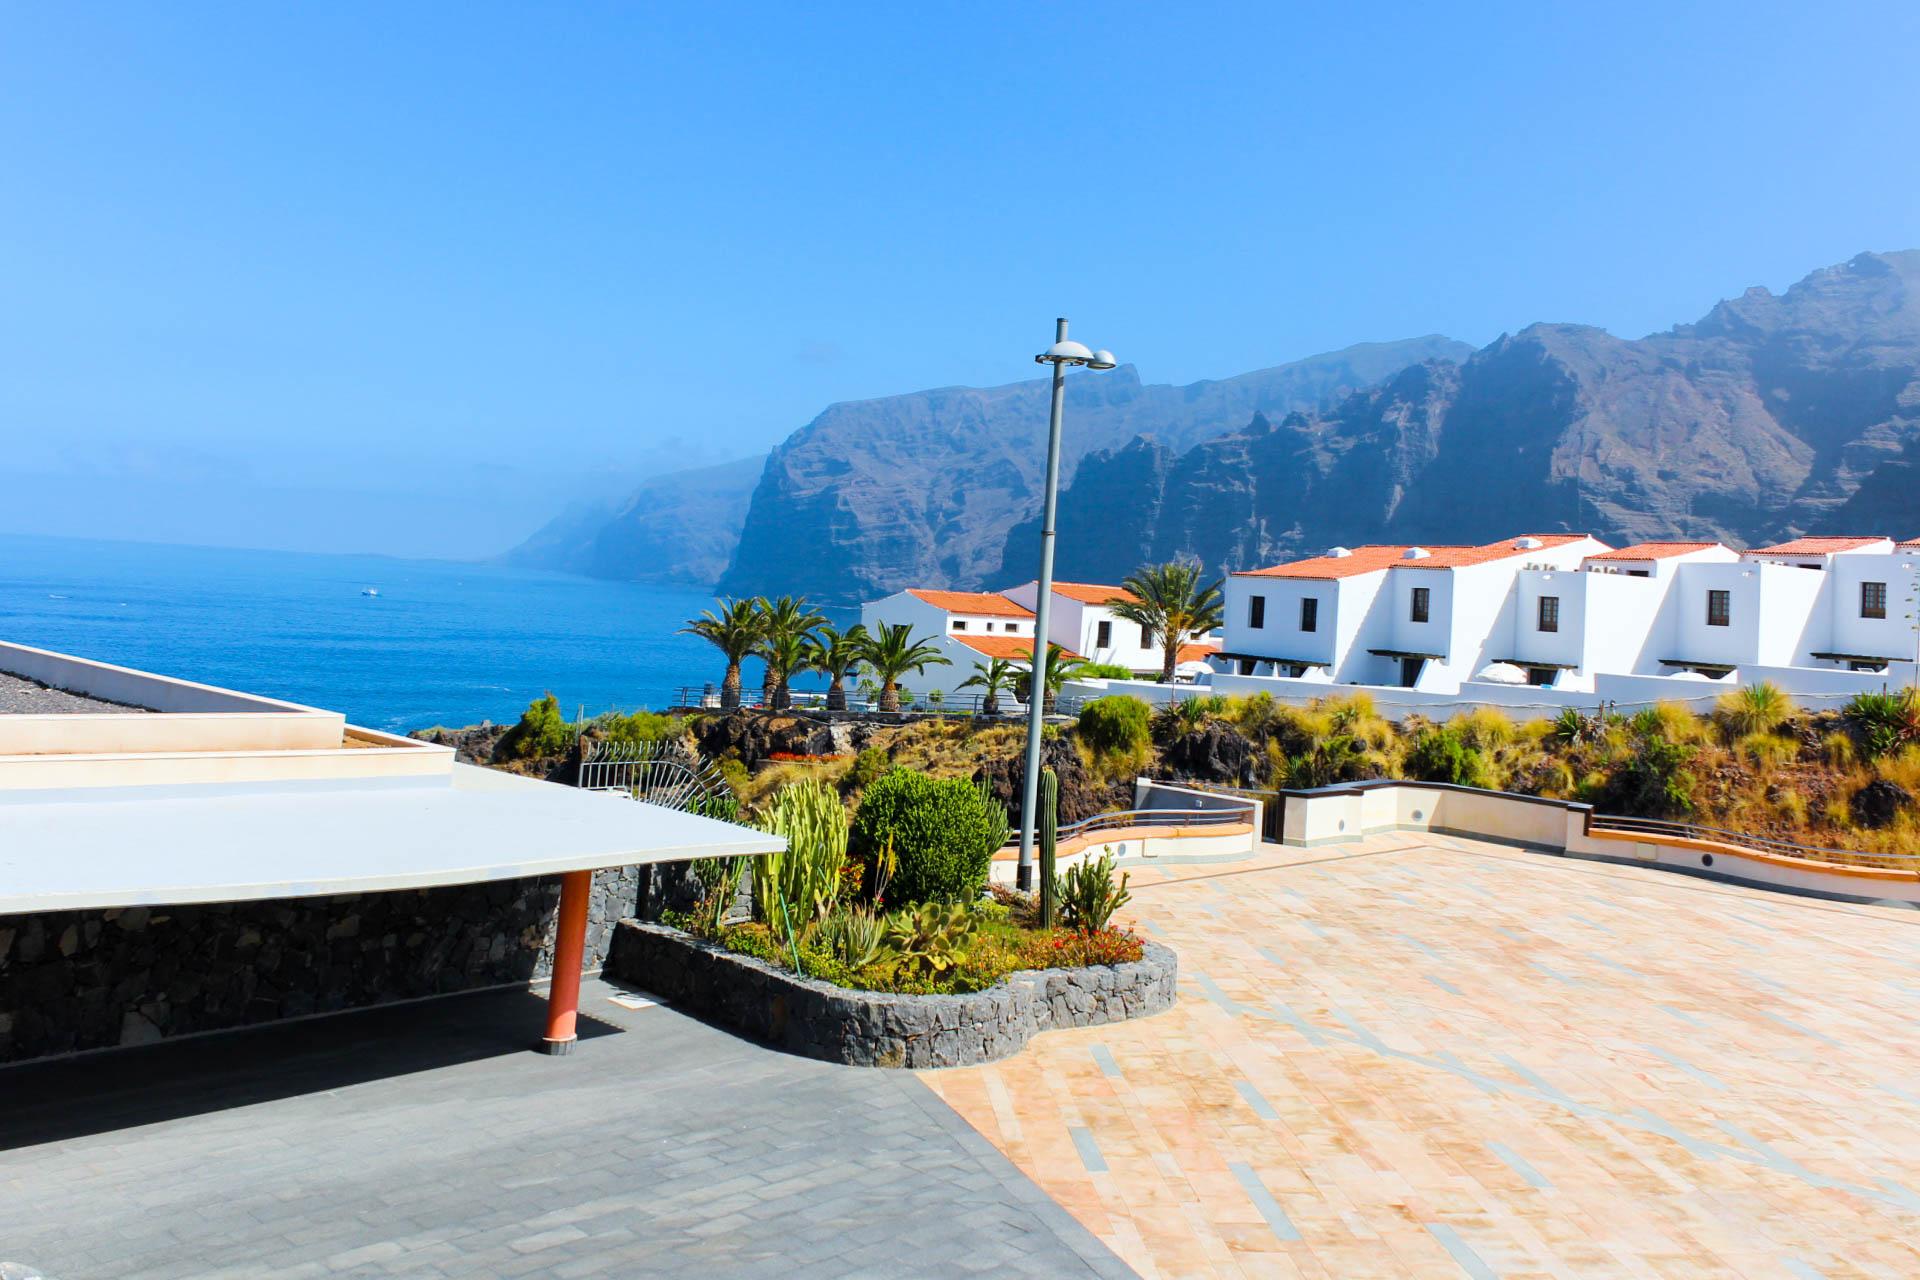 Room Escape Tenerife